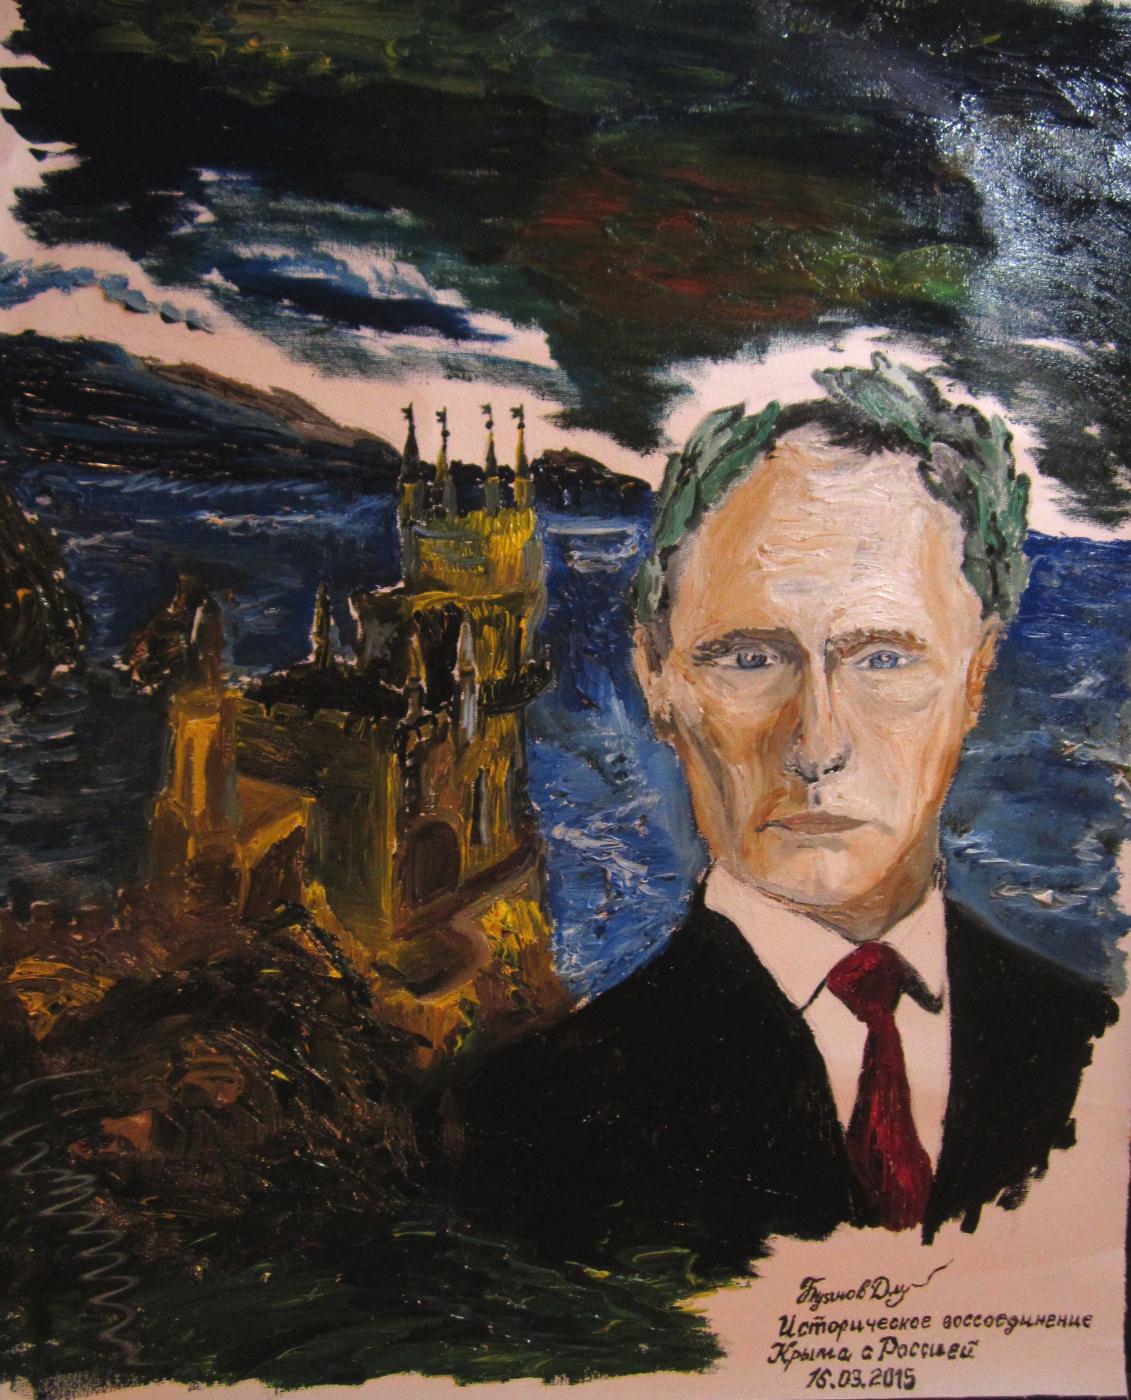 Дмитрий Юрьевич Буянов. The historic reunification of the Crimea with Russia